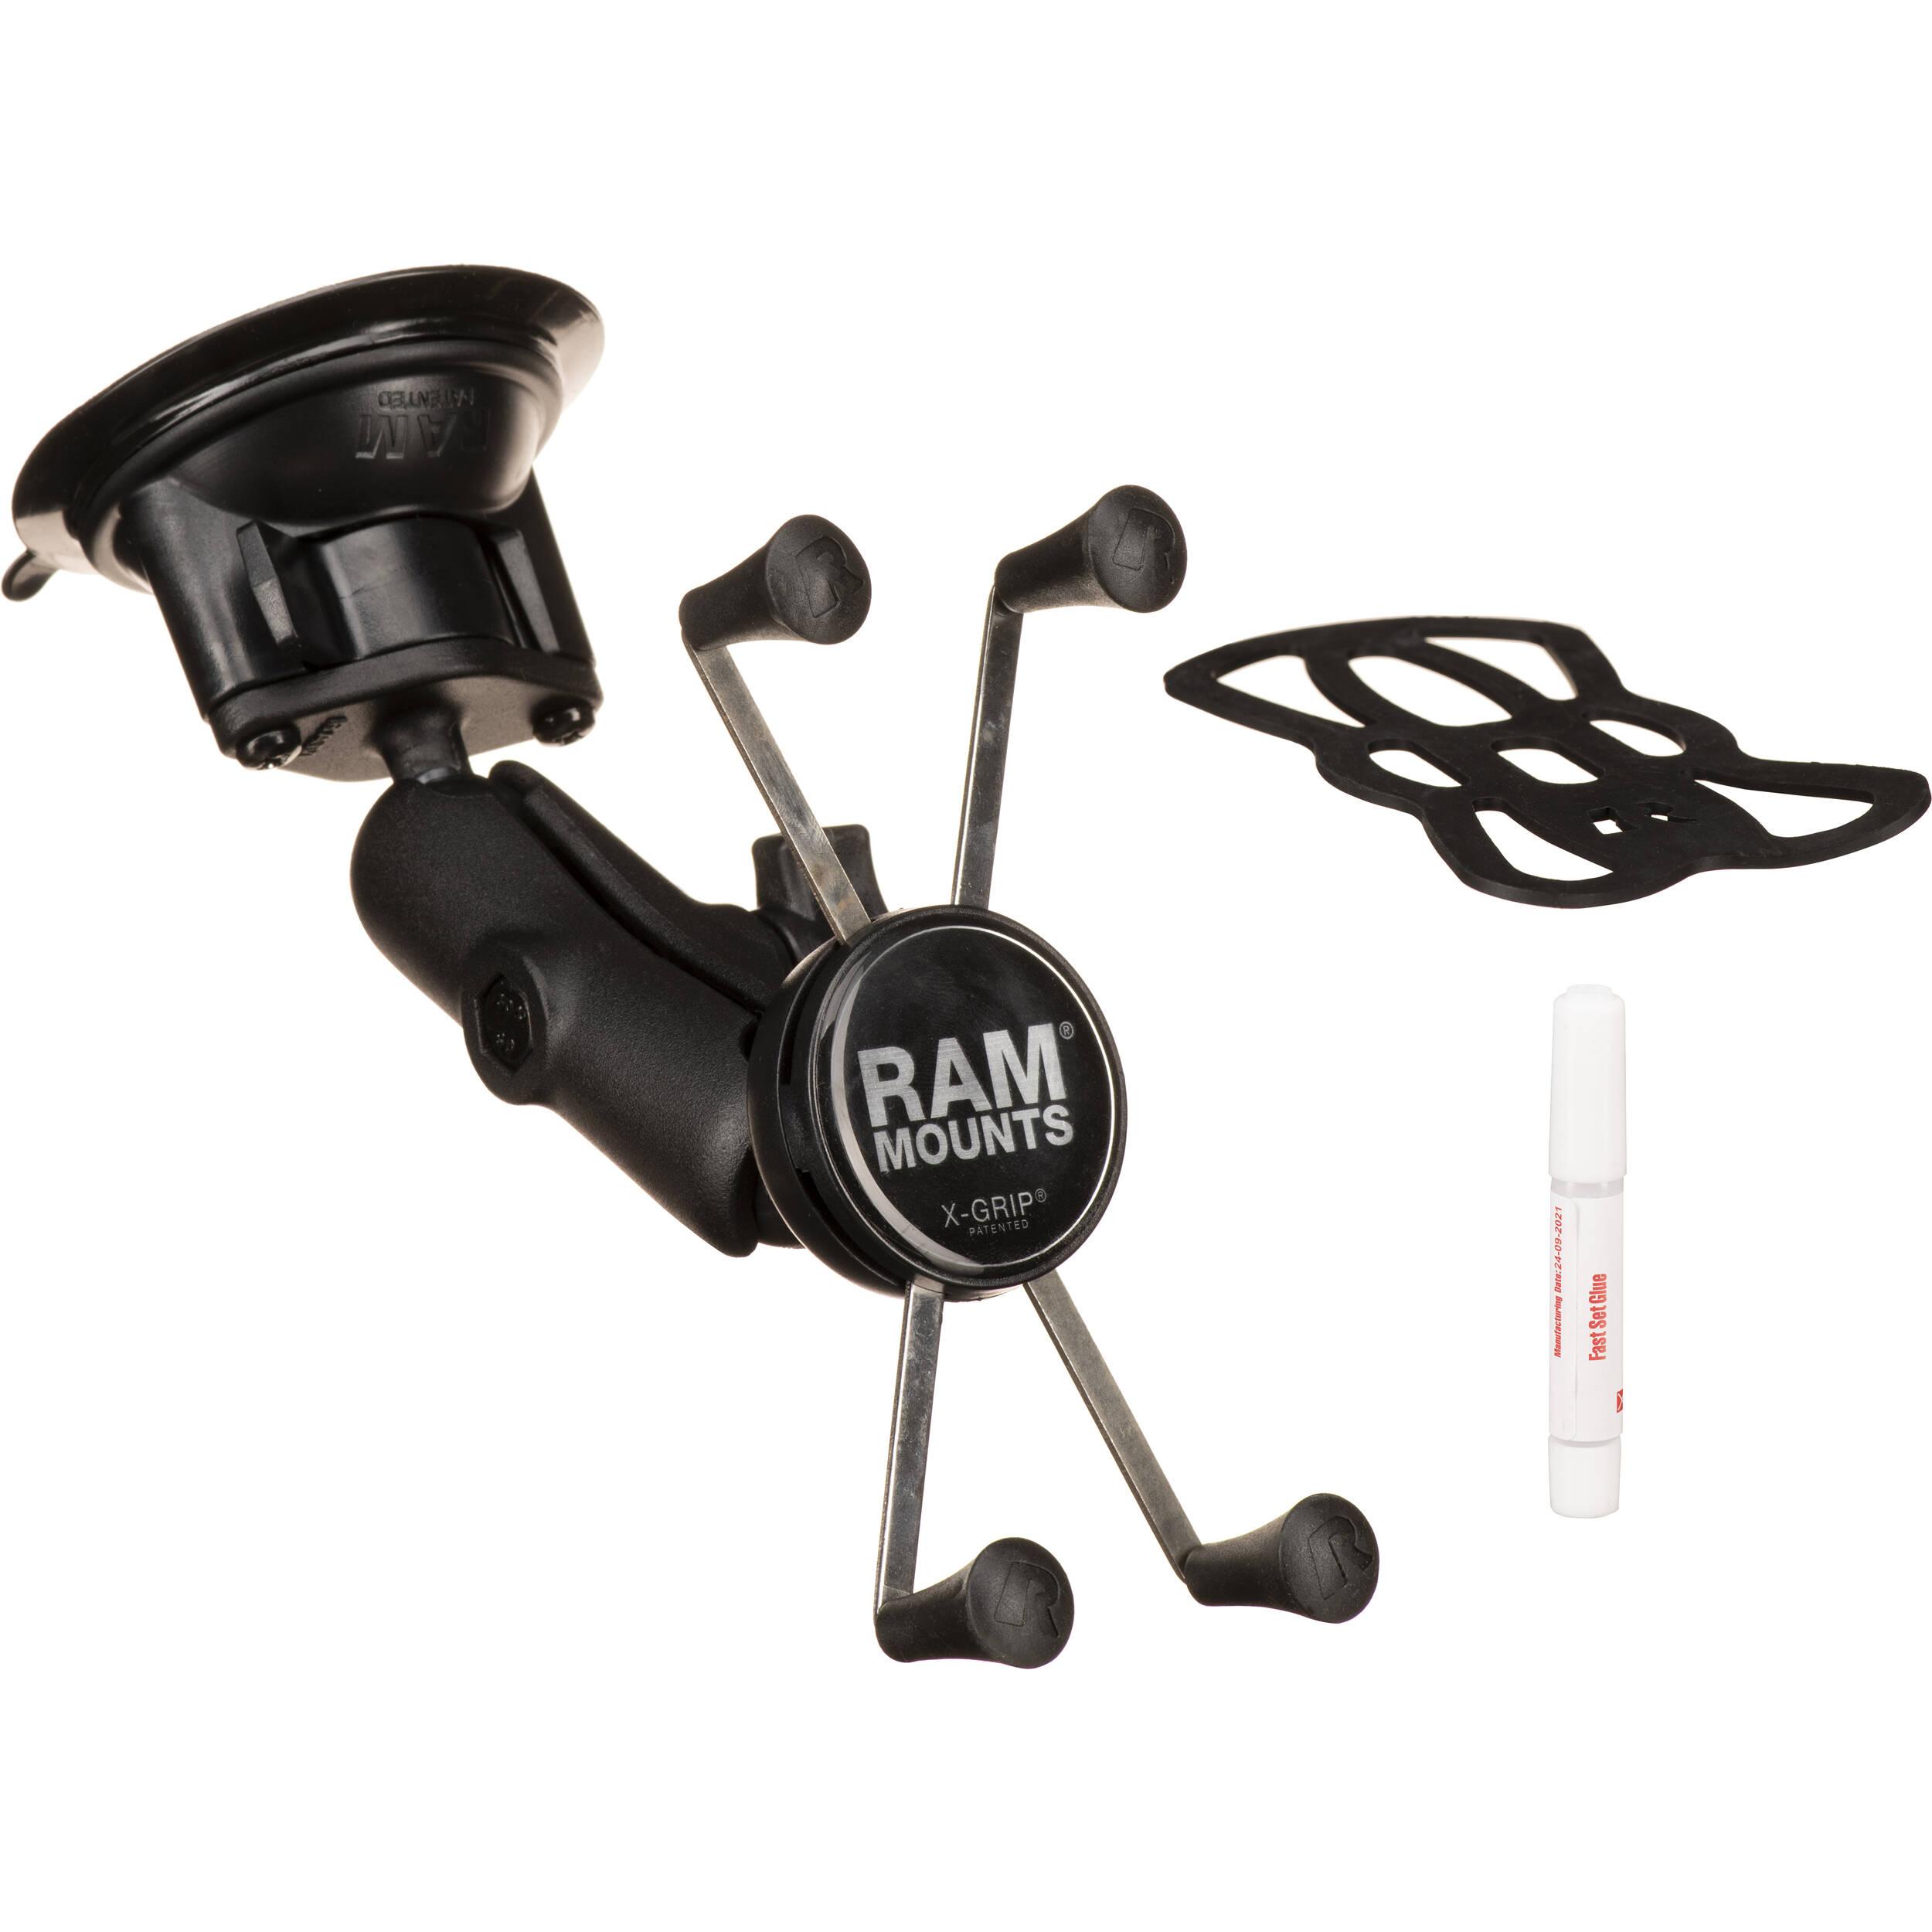 RAM MOUNTS Twist Lock Suction Cup Mount RAM-B-166-UN10U B&H